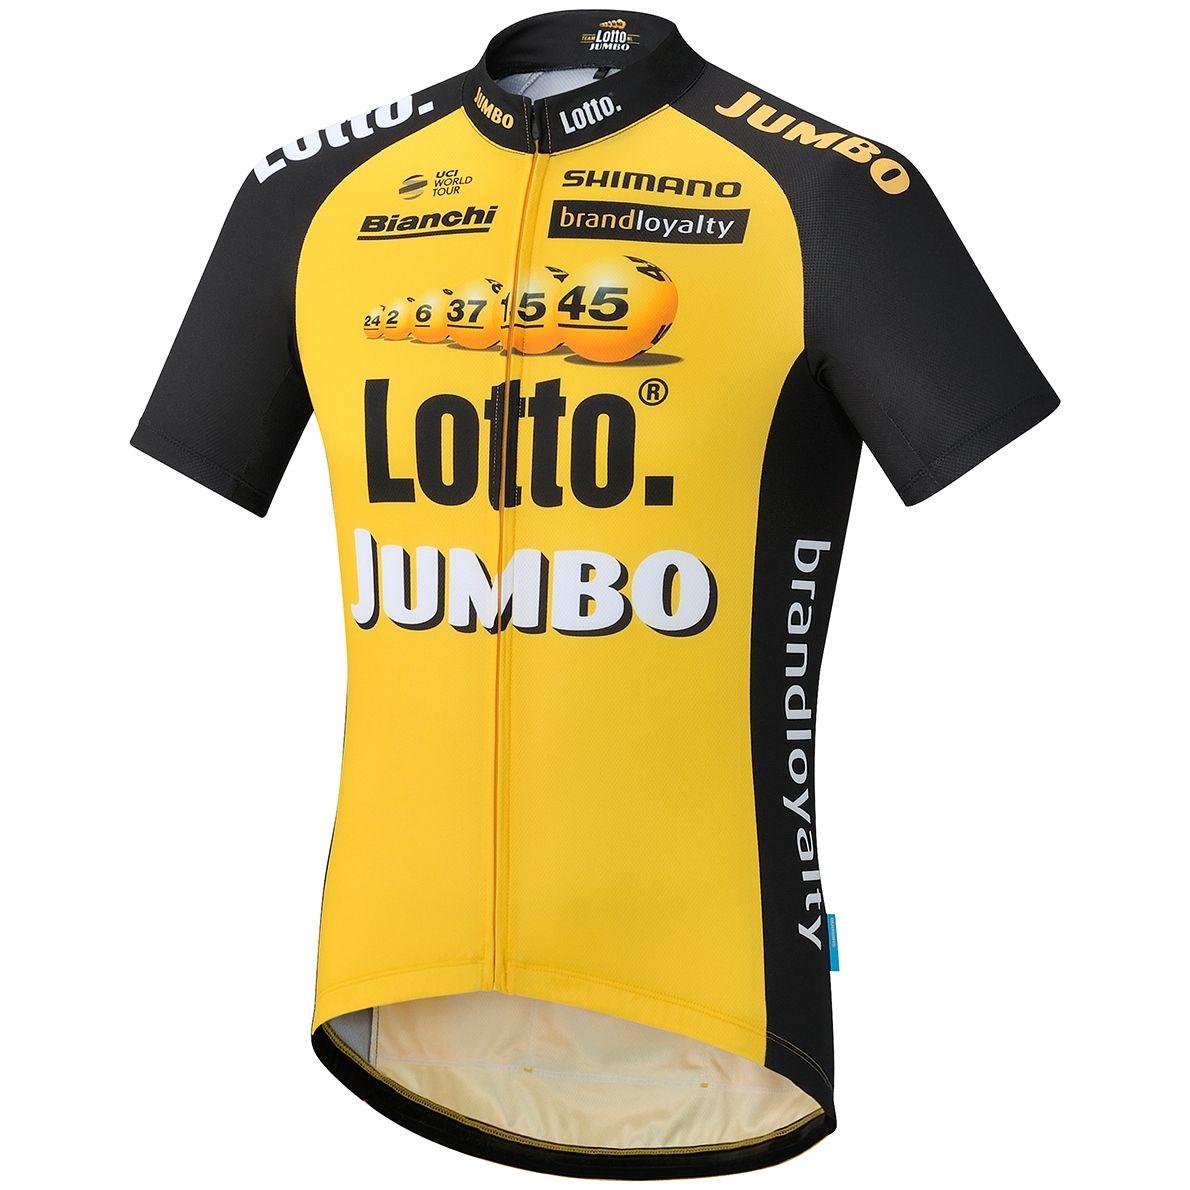 Radtrikot Team LOTTONL-JUMBO Jersey Repl., 13,99€ zzgl. Versand, Trikot, Fahrradtrikot und Trägerhose. Bei Pearl Izumi